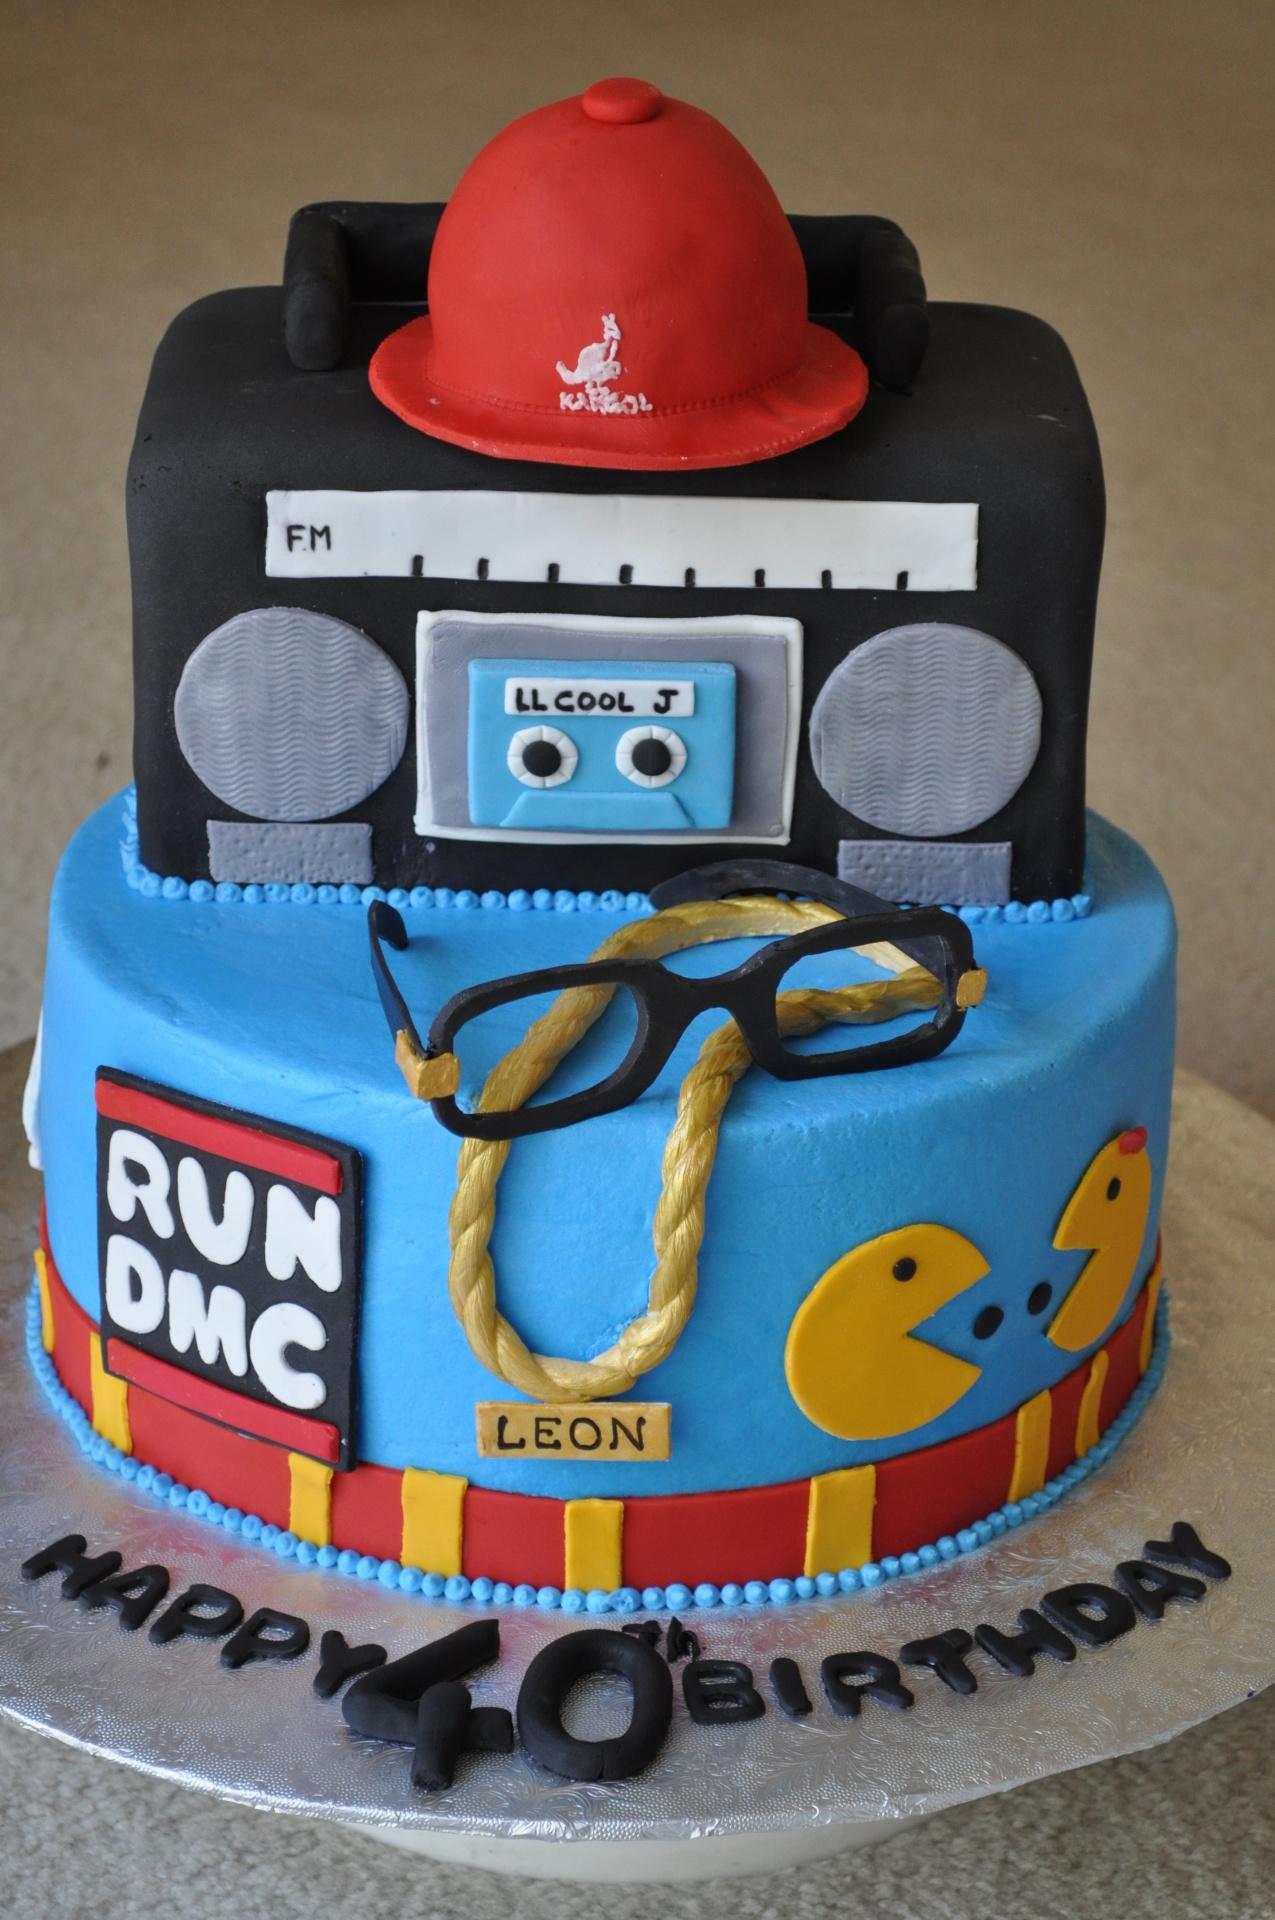 Custom 80s theme cake with boombox